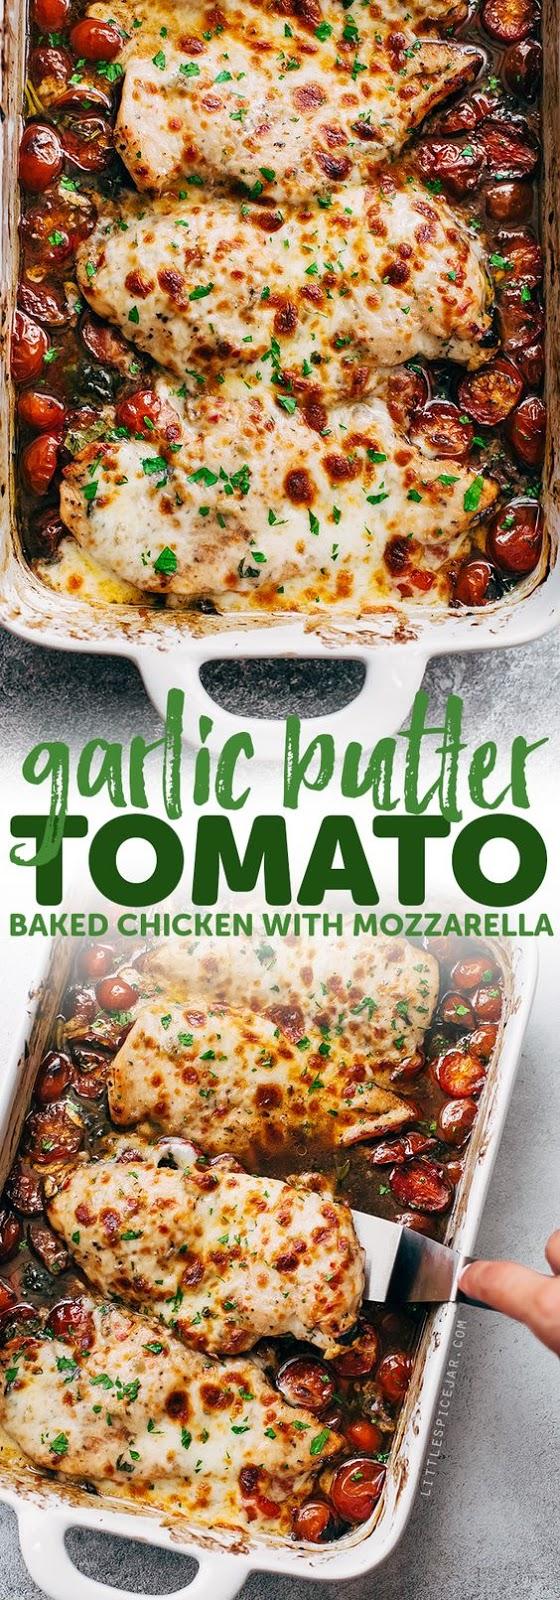 Garlic #Butter #Tomato #Baked #Chicken #with #Mozzarella